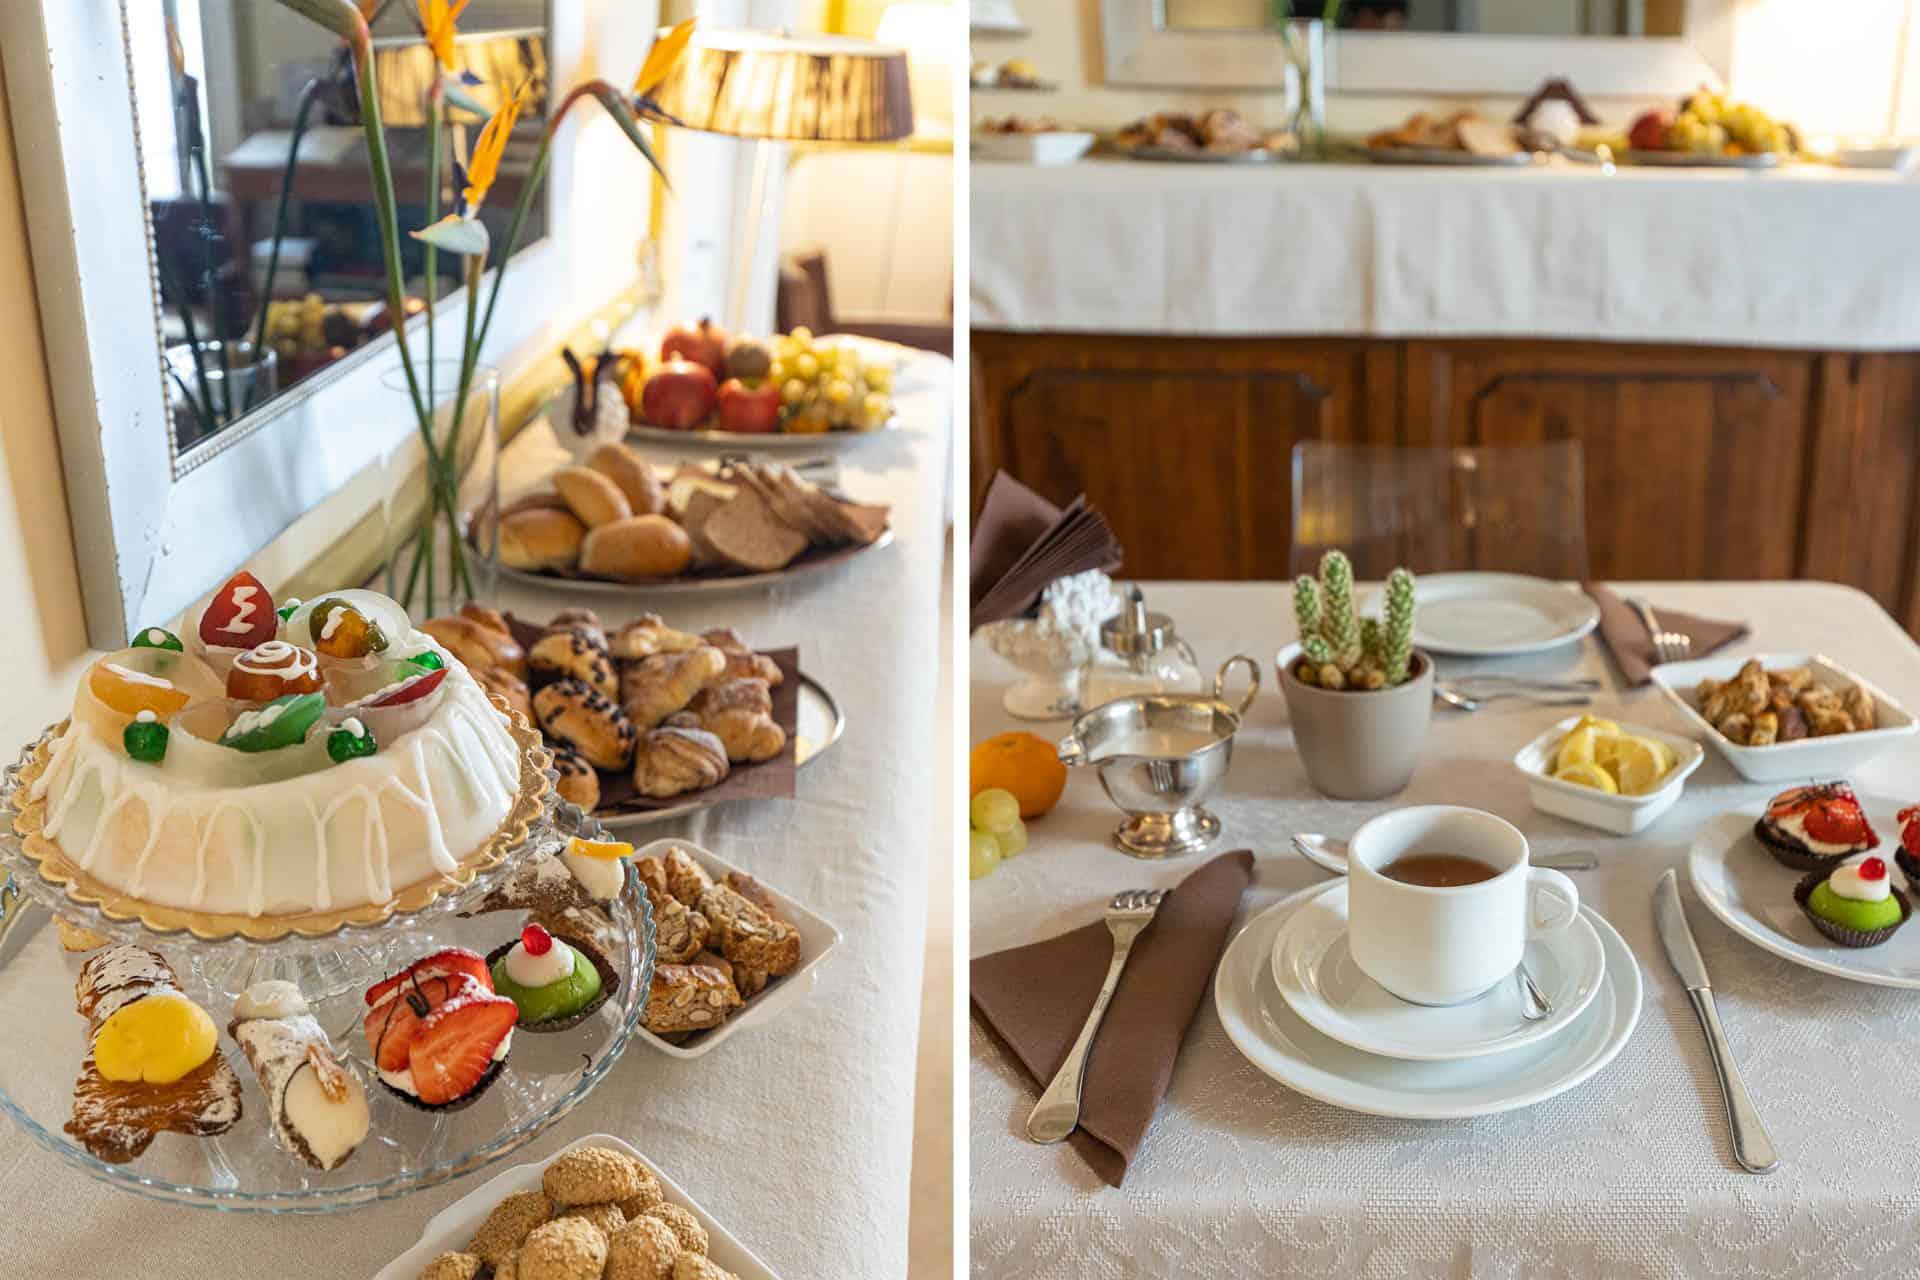 Sant'Agostino B&B palermo Centro - breakfast